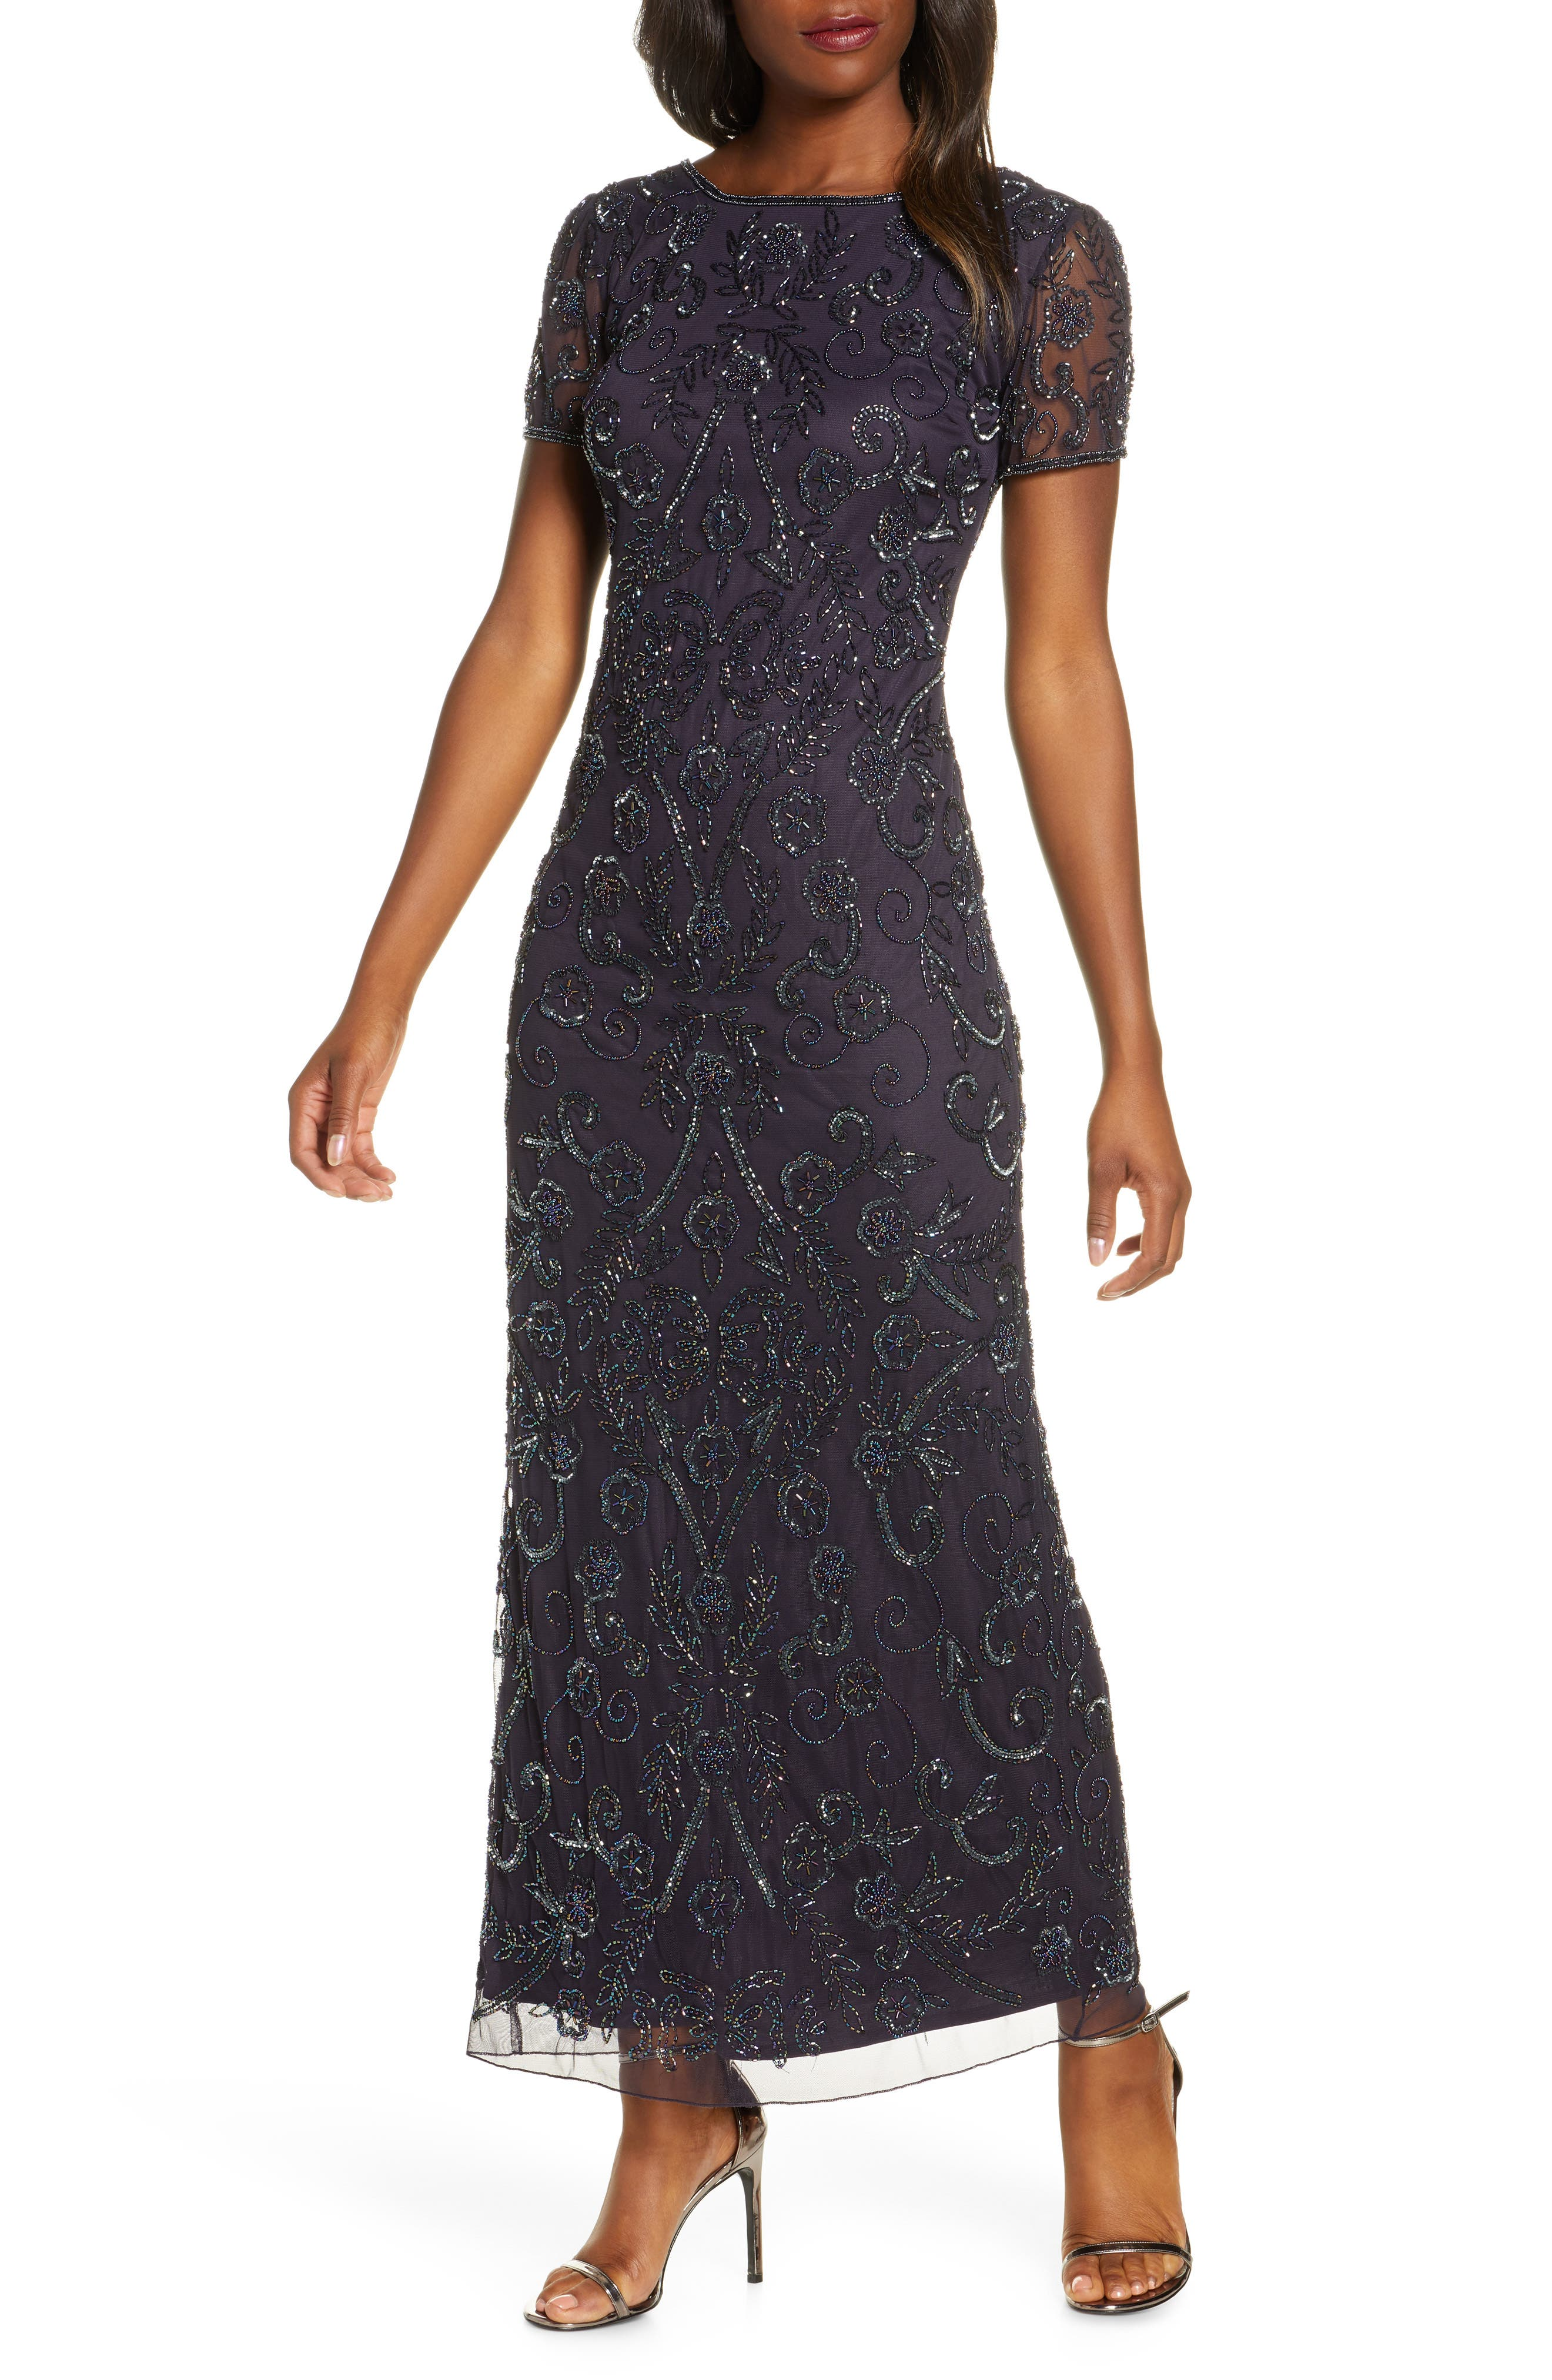 1920s Evening Dresses & Formal Gowns Womens Pisarro Nights Embellished Mesh Evening Dress Size 12 - Purple $208.00 AT vintagedancer.com